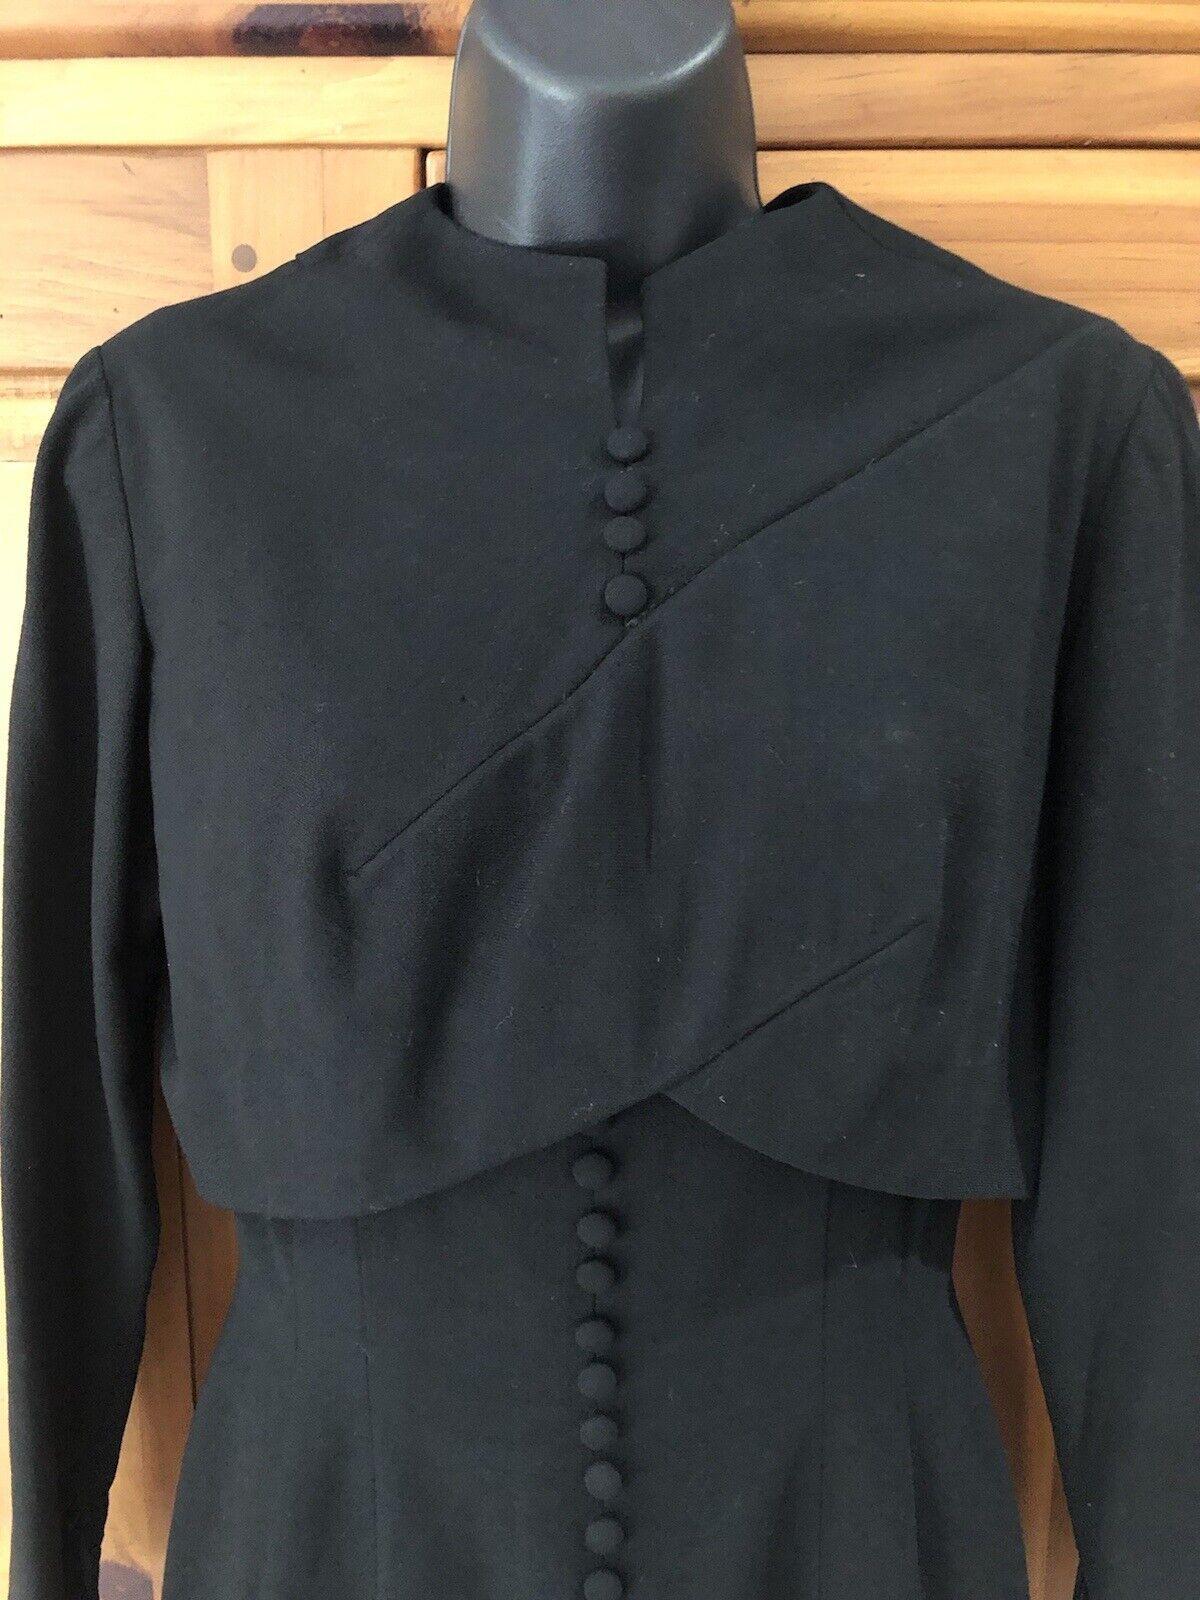 Travilla vintage 60s/70s black wool crepe dress s… - image 3